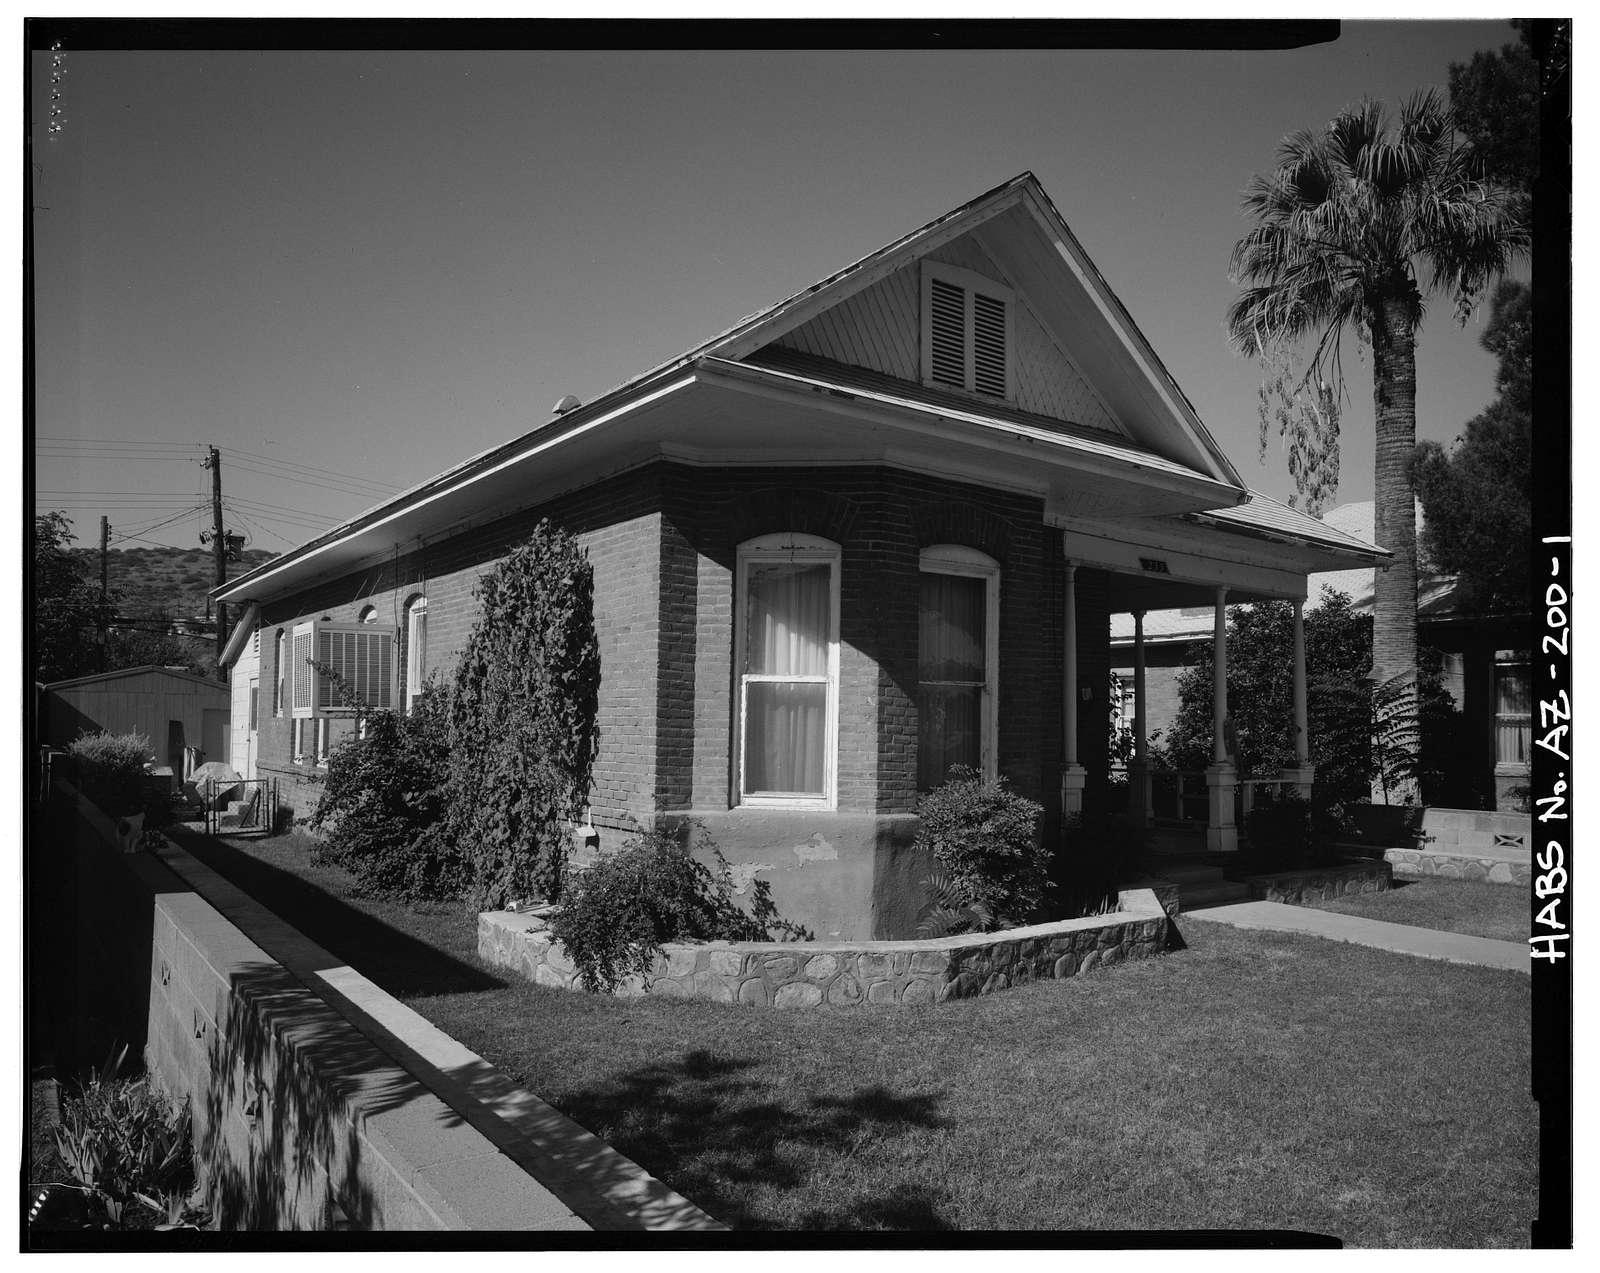 Henry H. Hill Rental House, 235 Coronado Boulevard, Clifton, Greenlee County, AZ